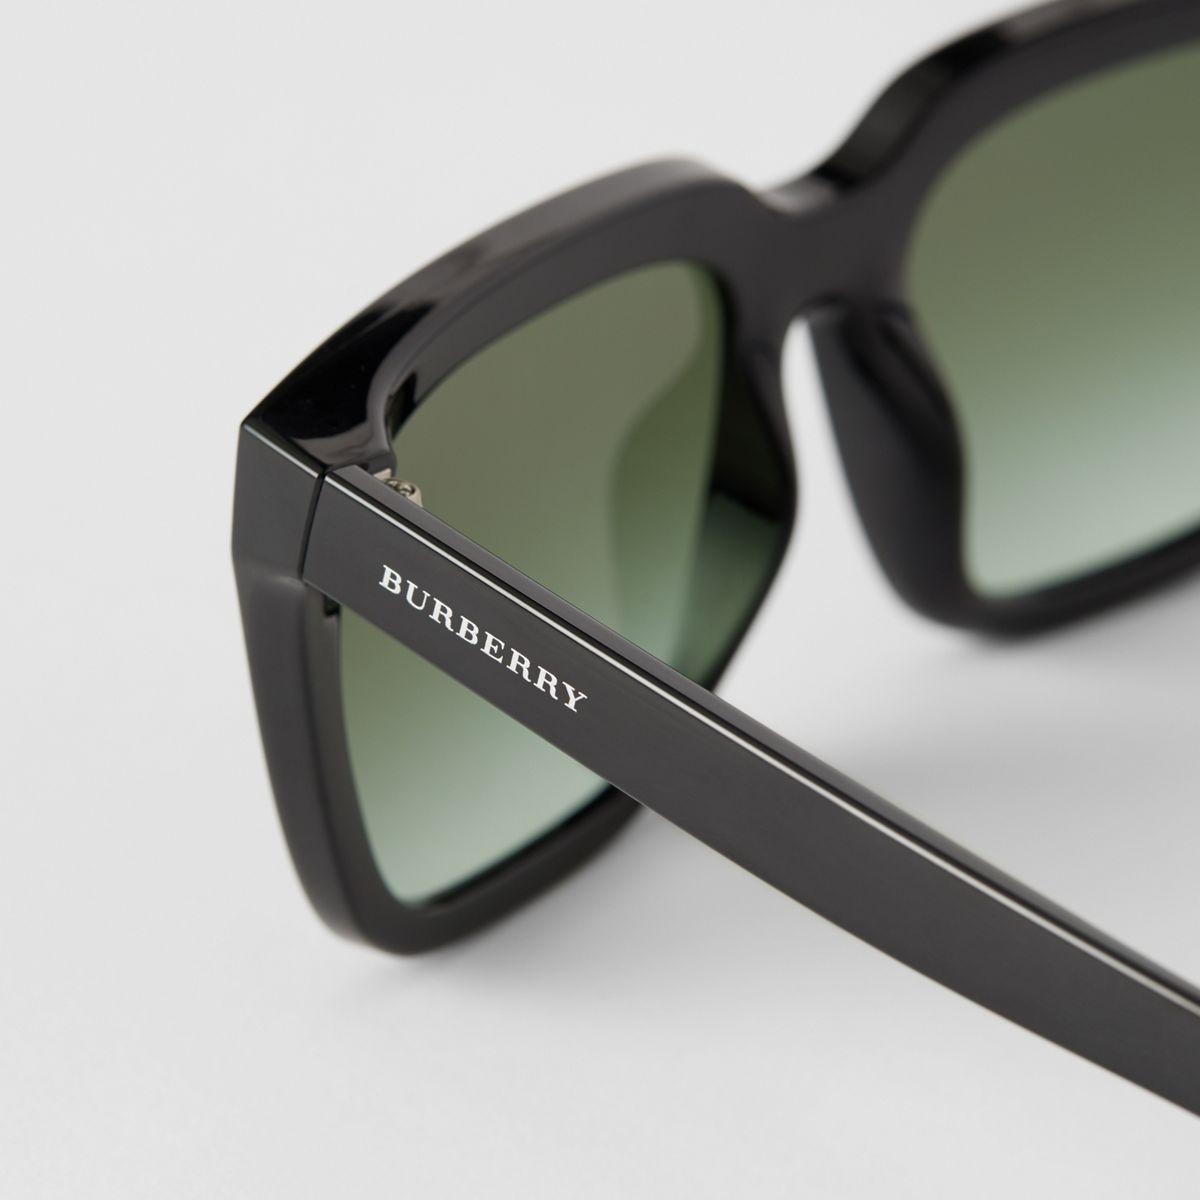 da217fc746bf Burberry - Black Square Frame Shield Sunglasses - Lyst. View fullscreen